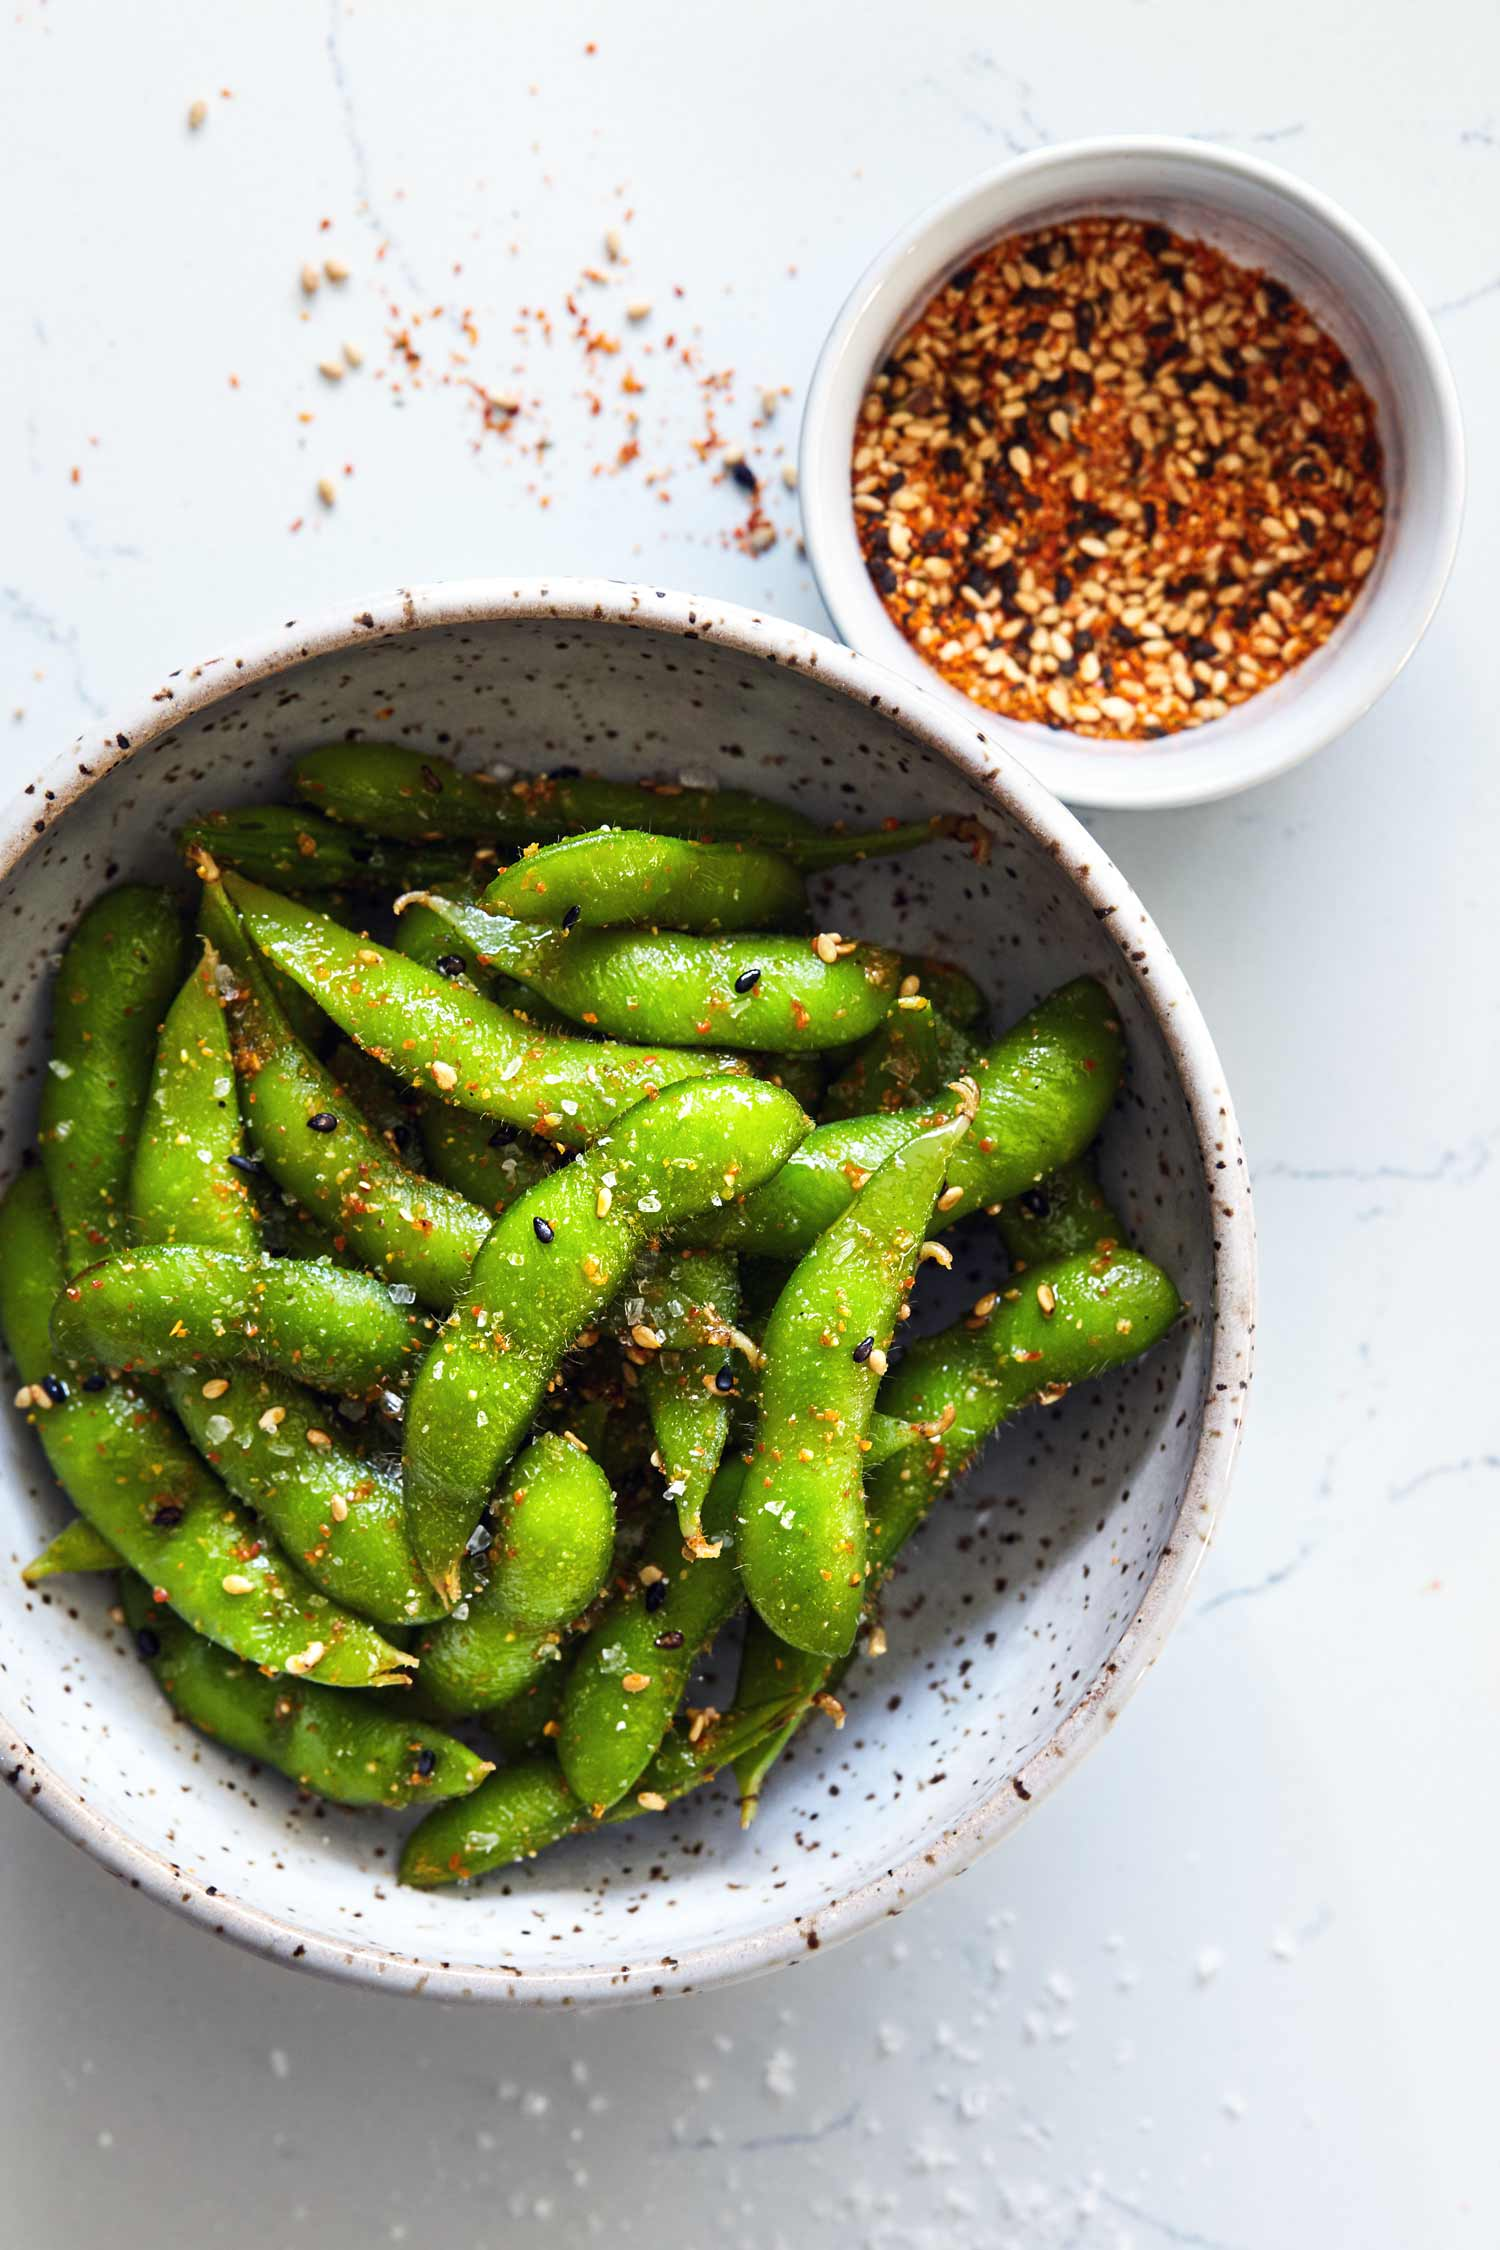 Sesame-Spiced-Edamame-Evergreen-Kitchen-1.jpg